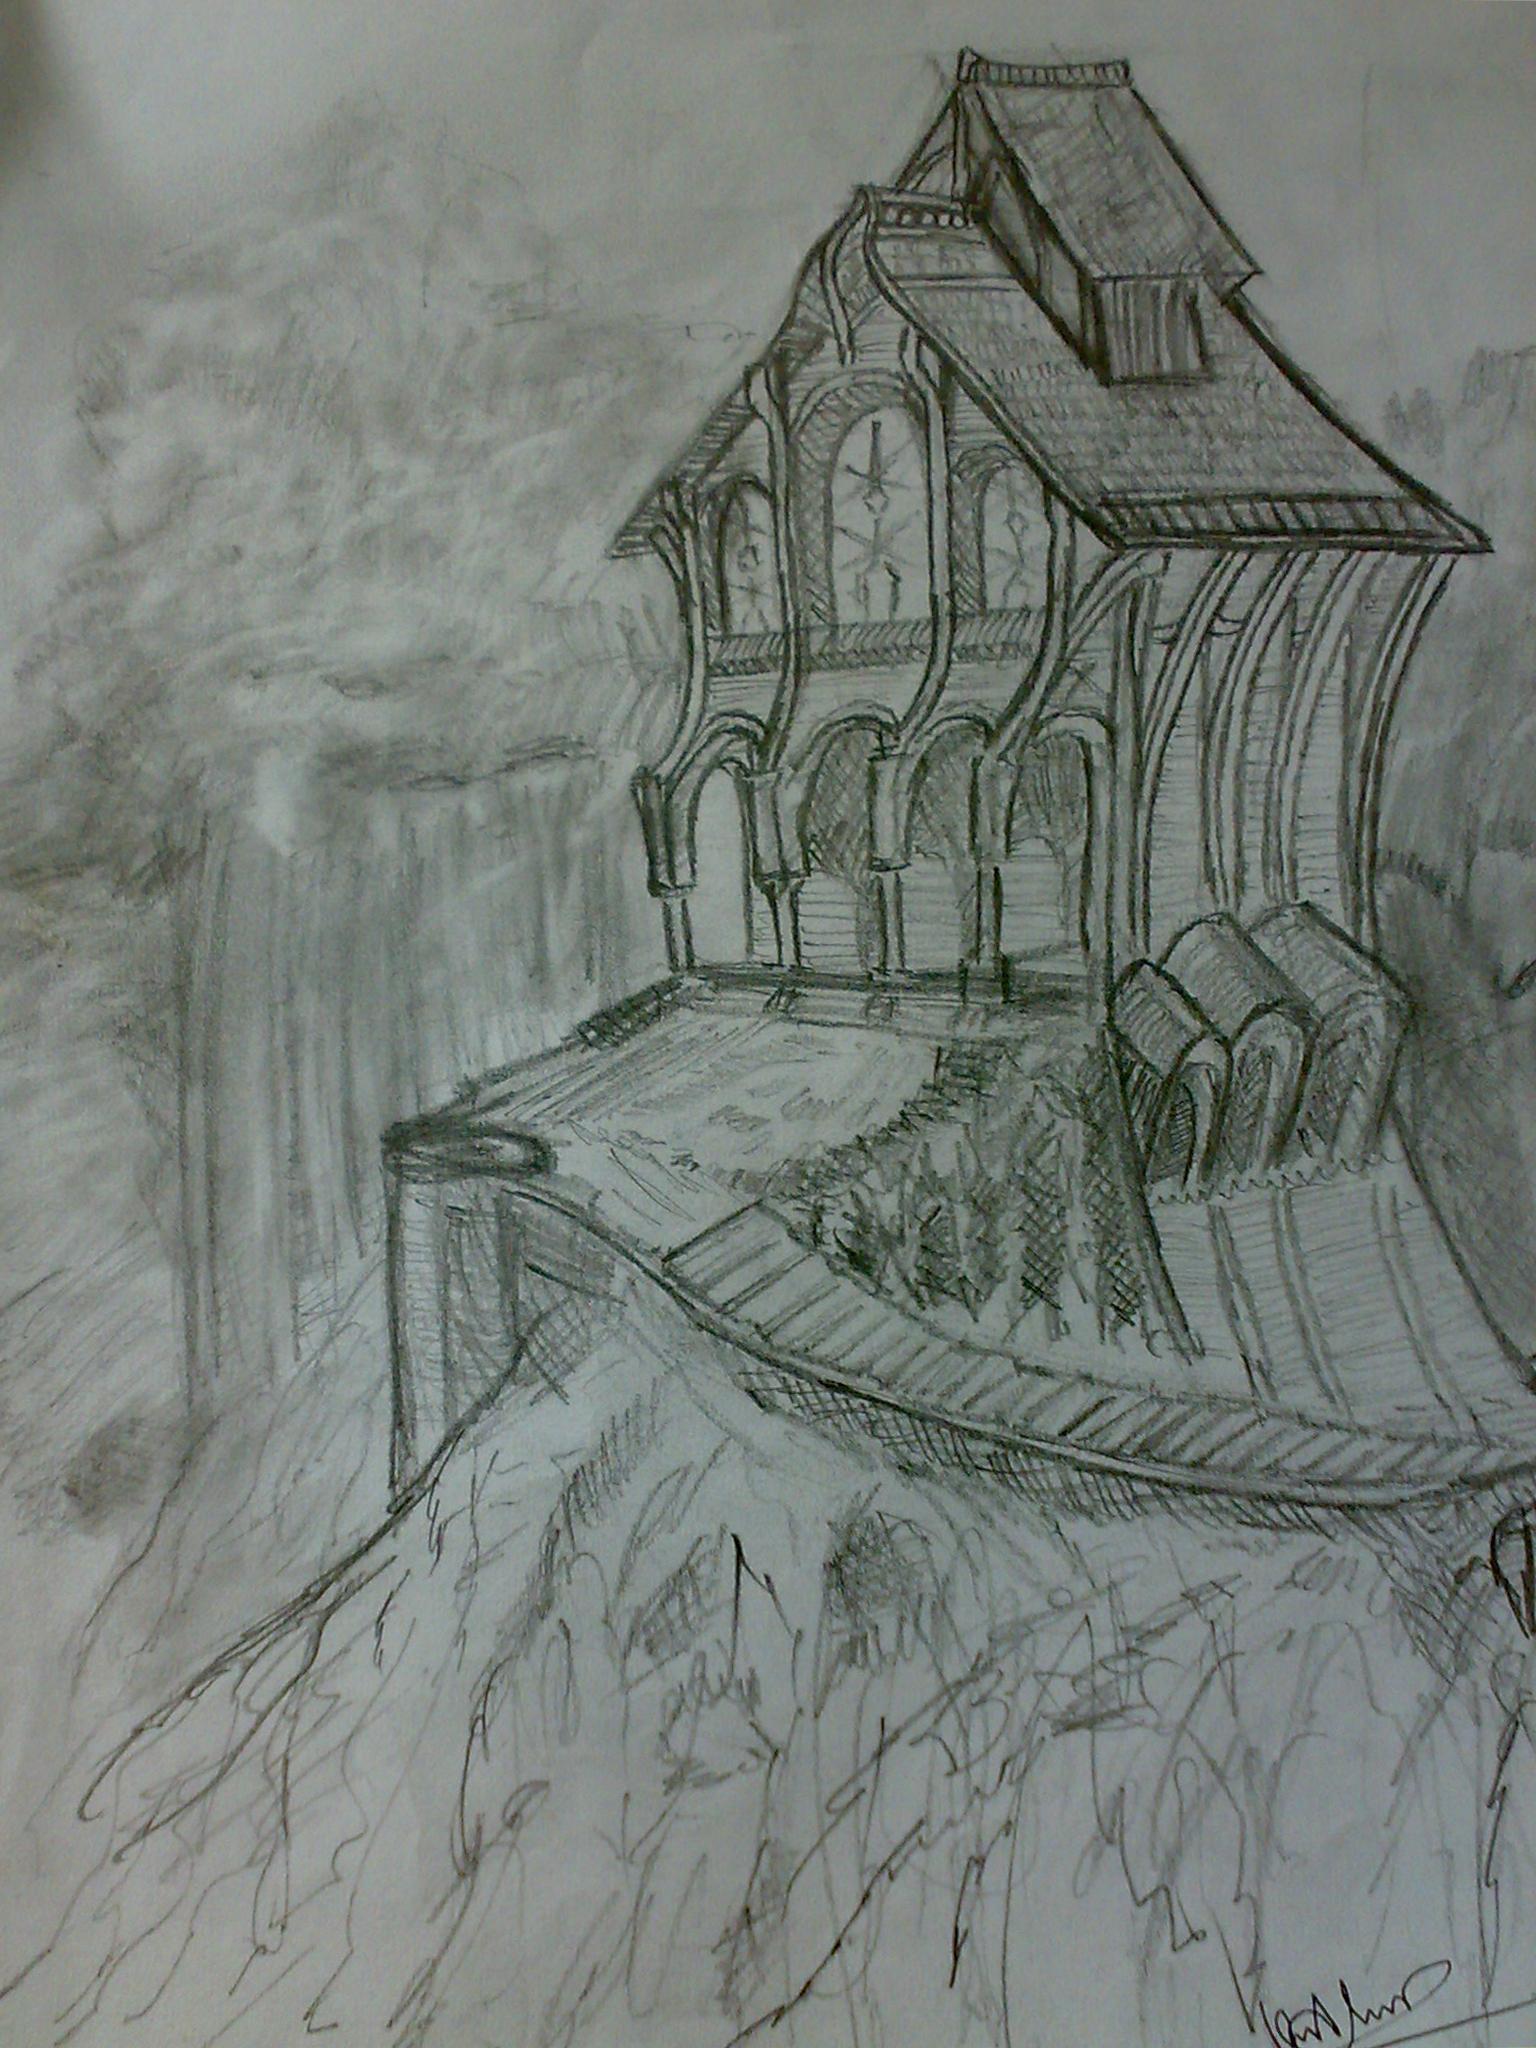 Lukisan Pensil Keren : lukisan, pensil, keren, Stock, Photo, Color, Pencil,, Drawing,, Manga